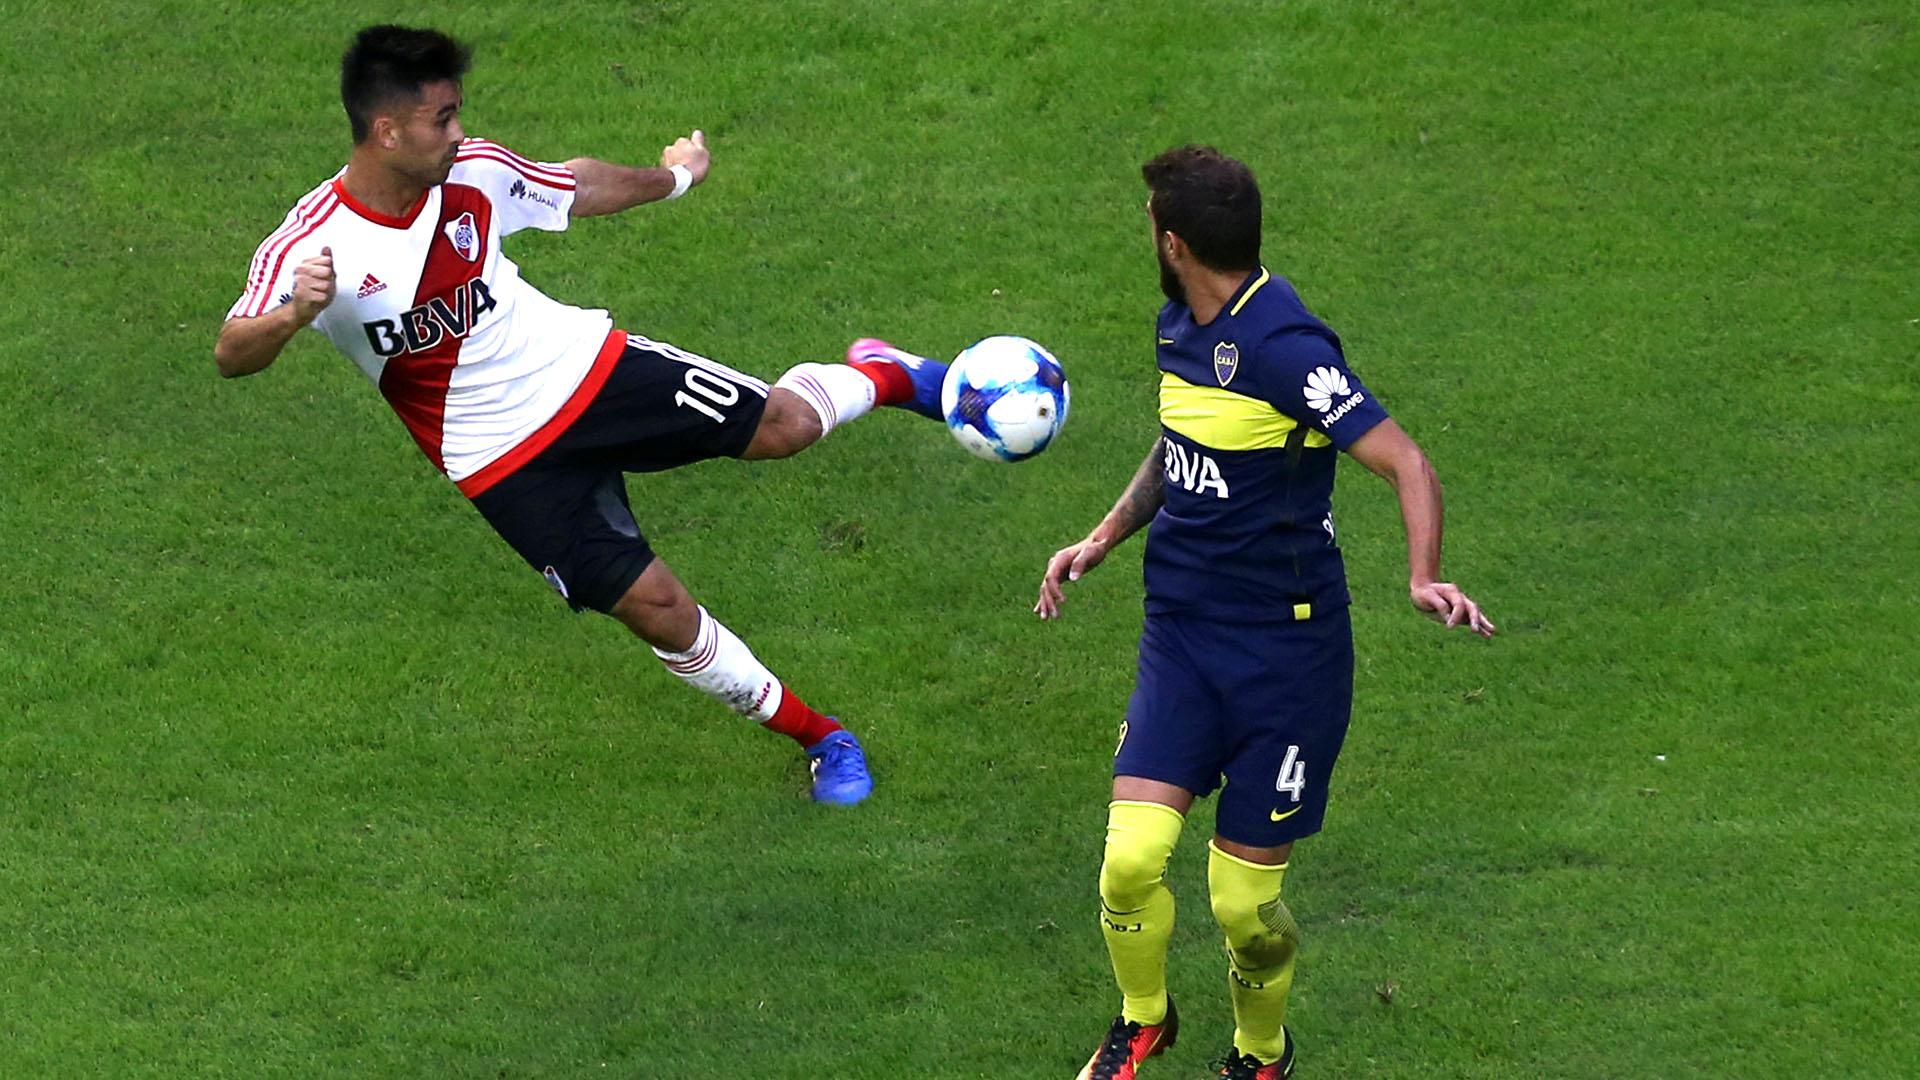 El gol de Pity Martínez a espaldas de Gino Peruzzi en un Superclásico entre Boca y River de 2017 (REUTERS)